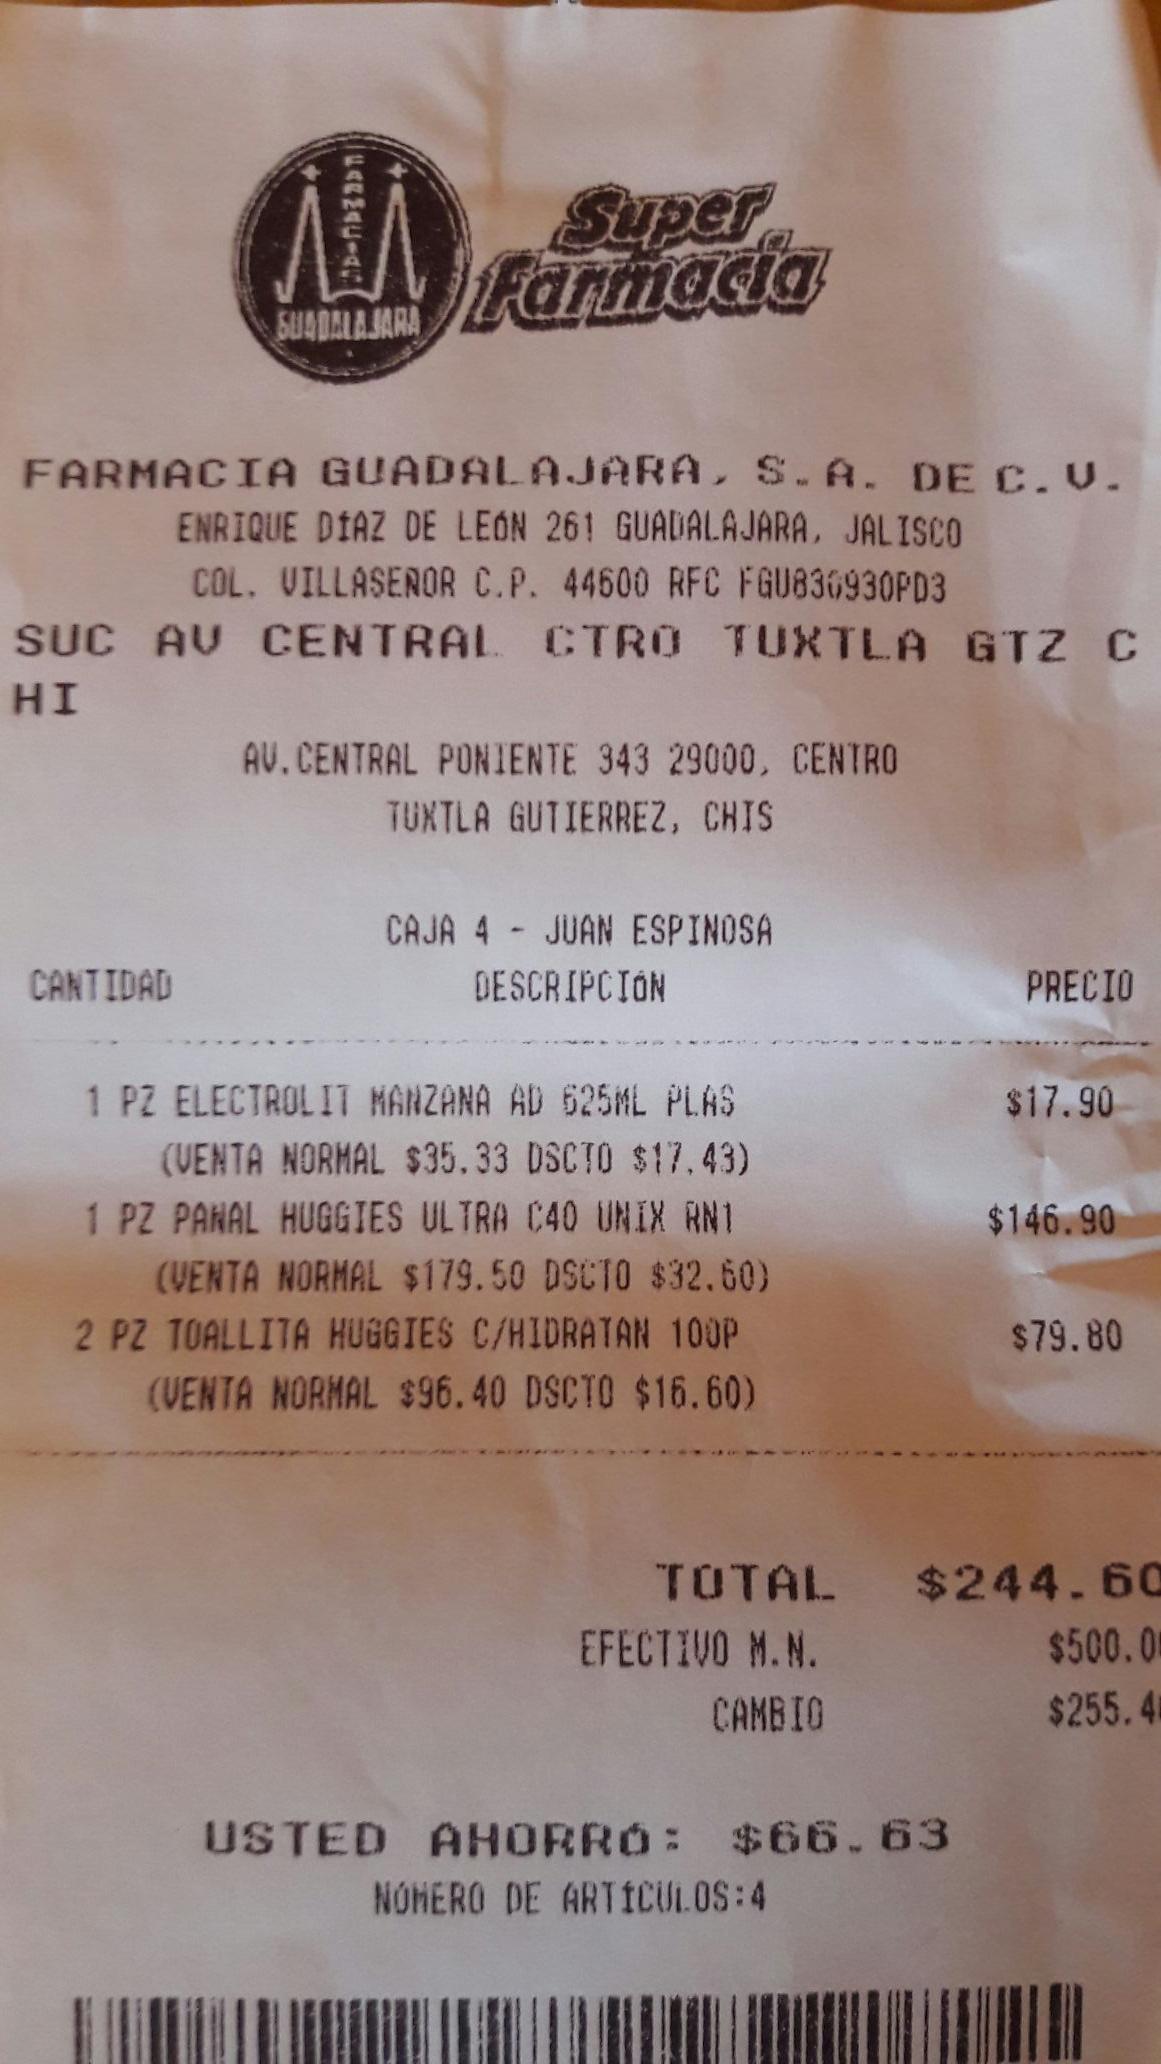 Farmacias Guadalajara: Toallitas Humedas Huggies Cuidado Hidrantante